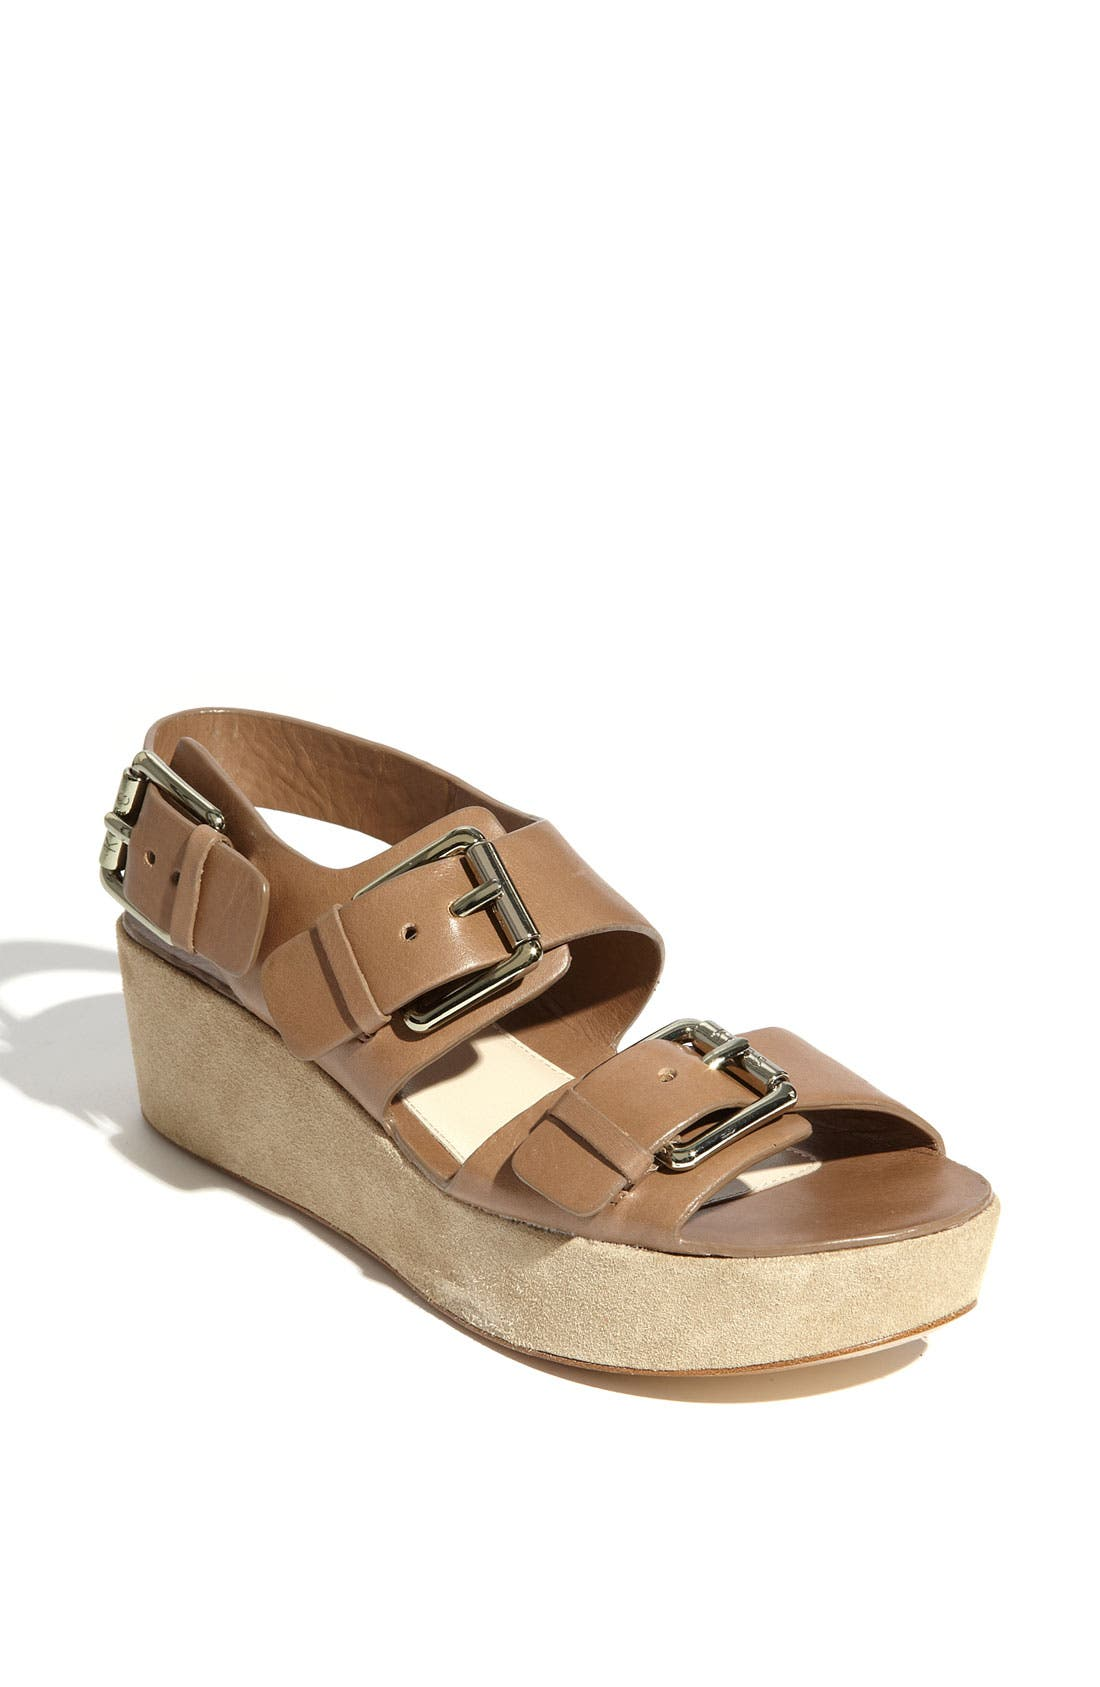 Alternate Image 1 Selected - KORS Michael Kors 'Zoe' Sandal